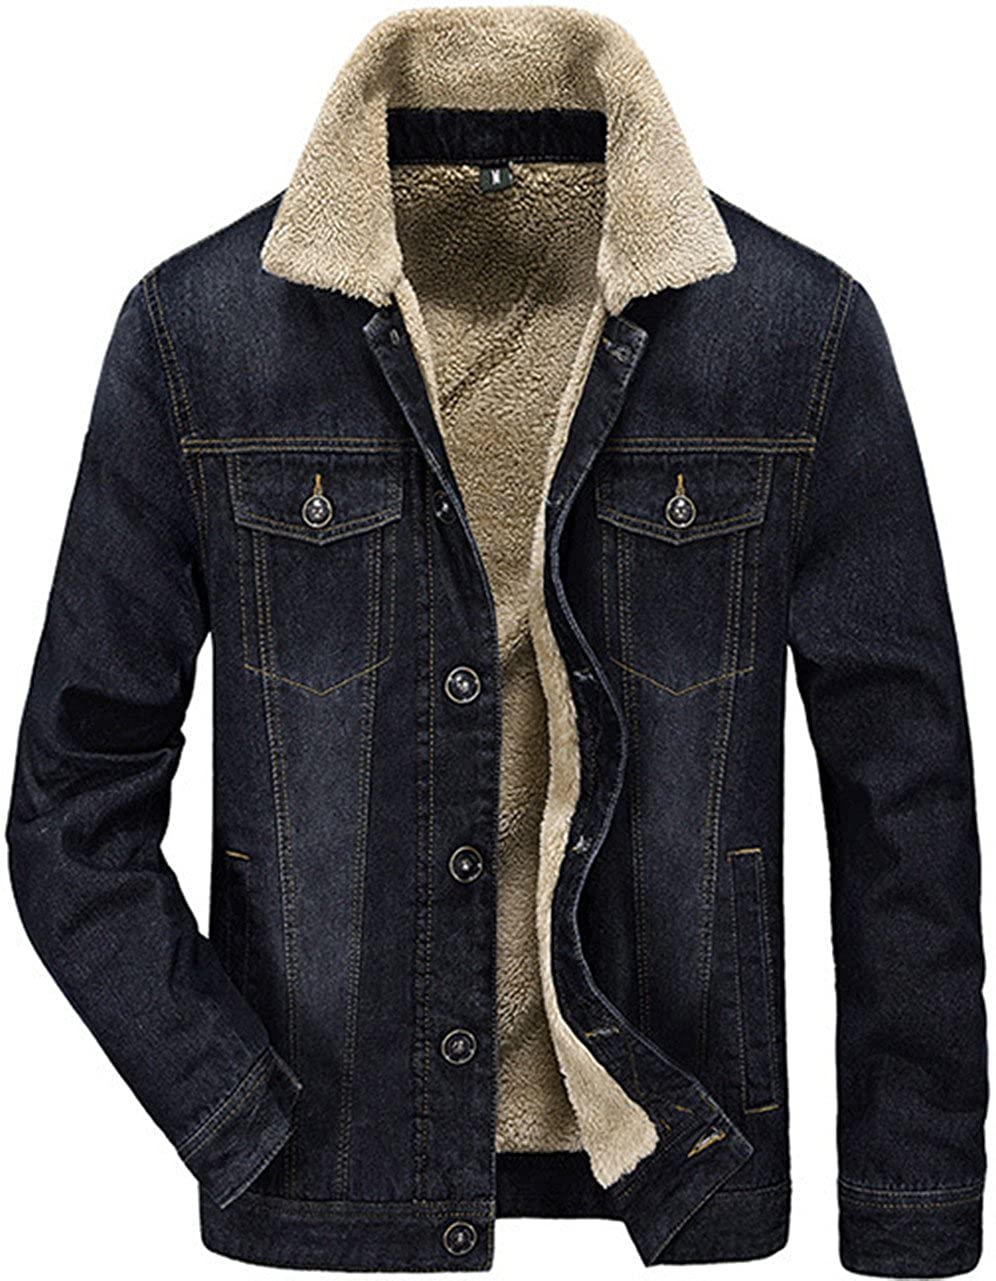 Mens Lapel Thicken Warm Denim Jacket Casual Parker Jacket